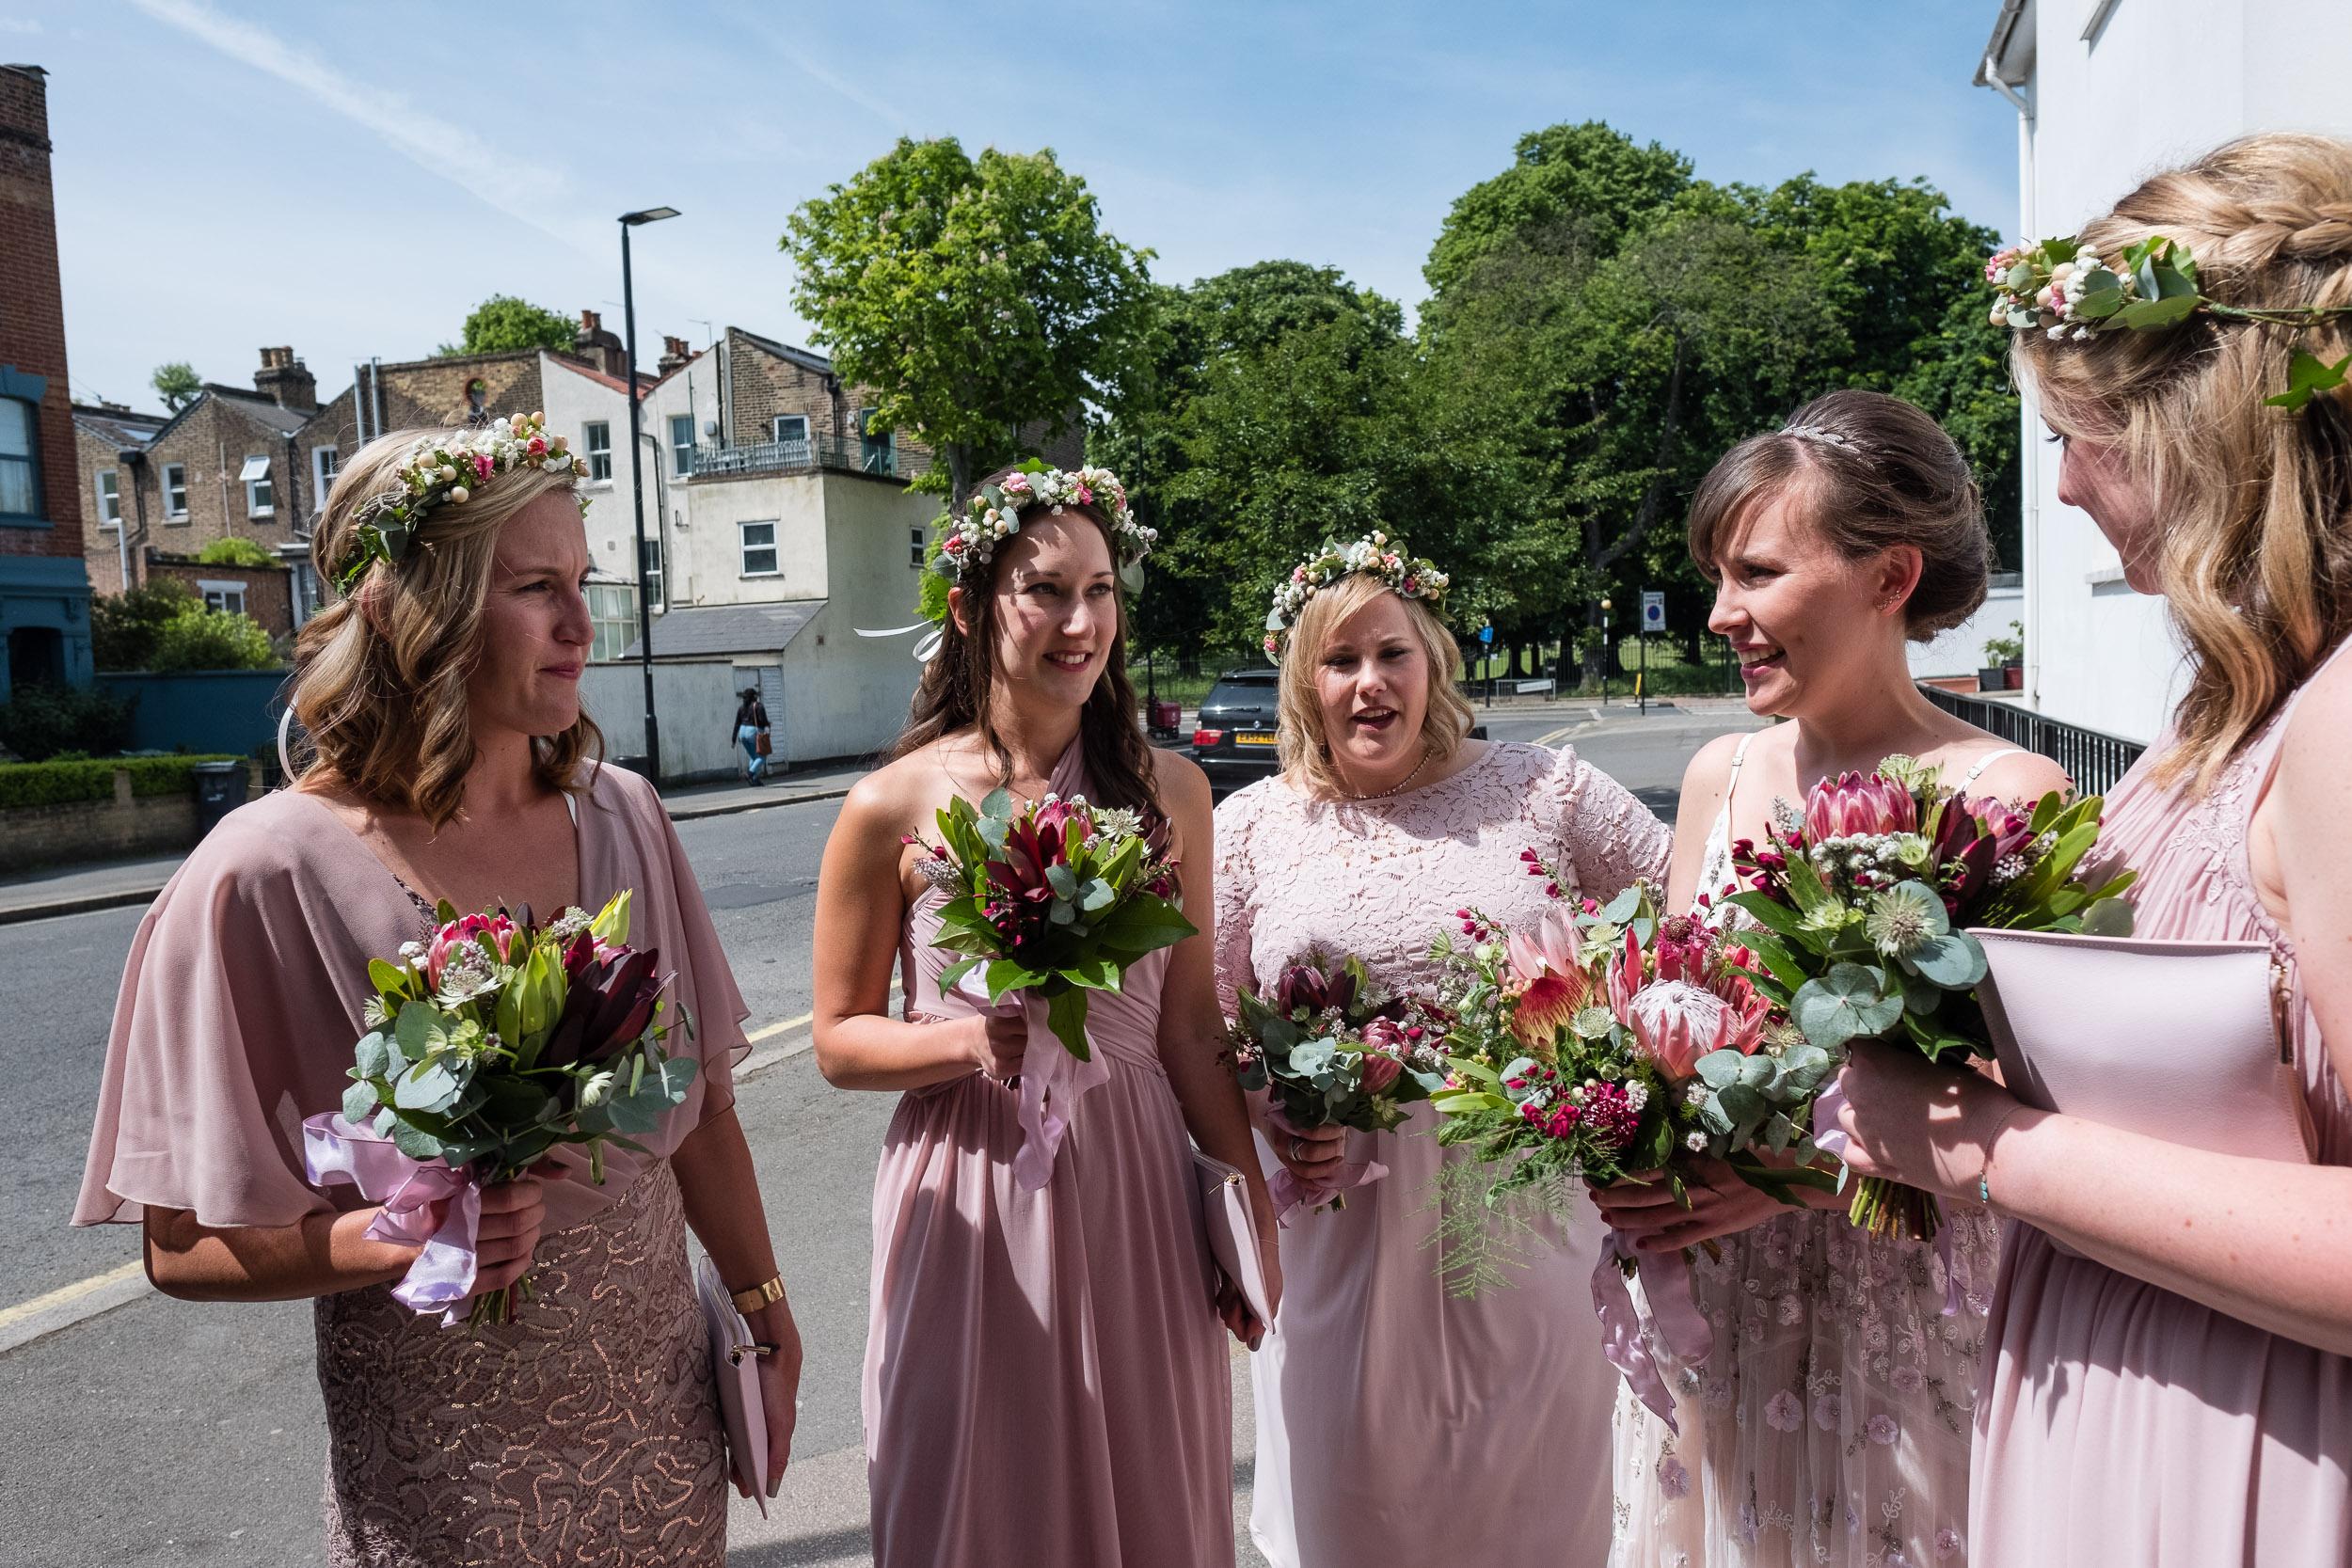 brockwell-lido-brixton-herne-hill-wedding-035.jpg